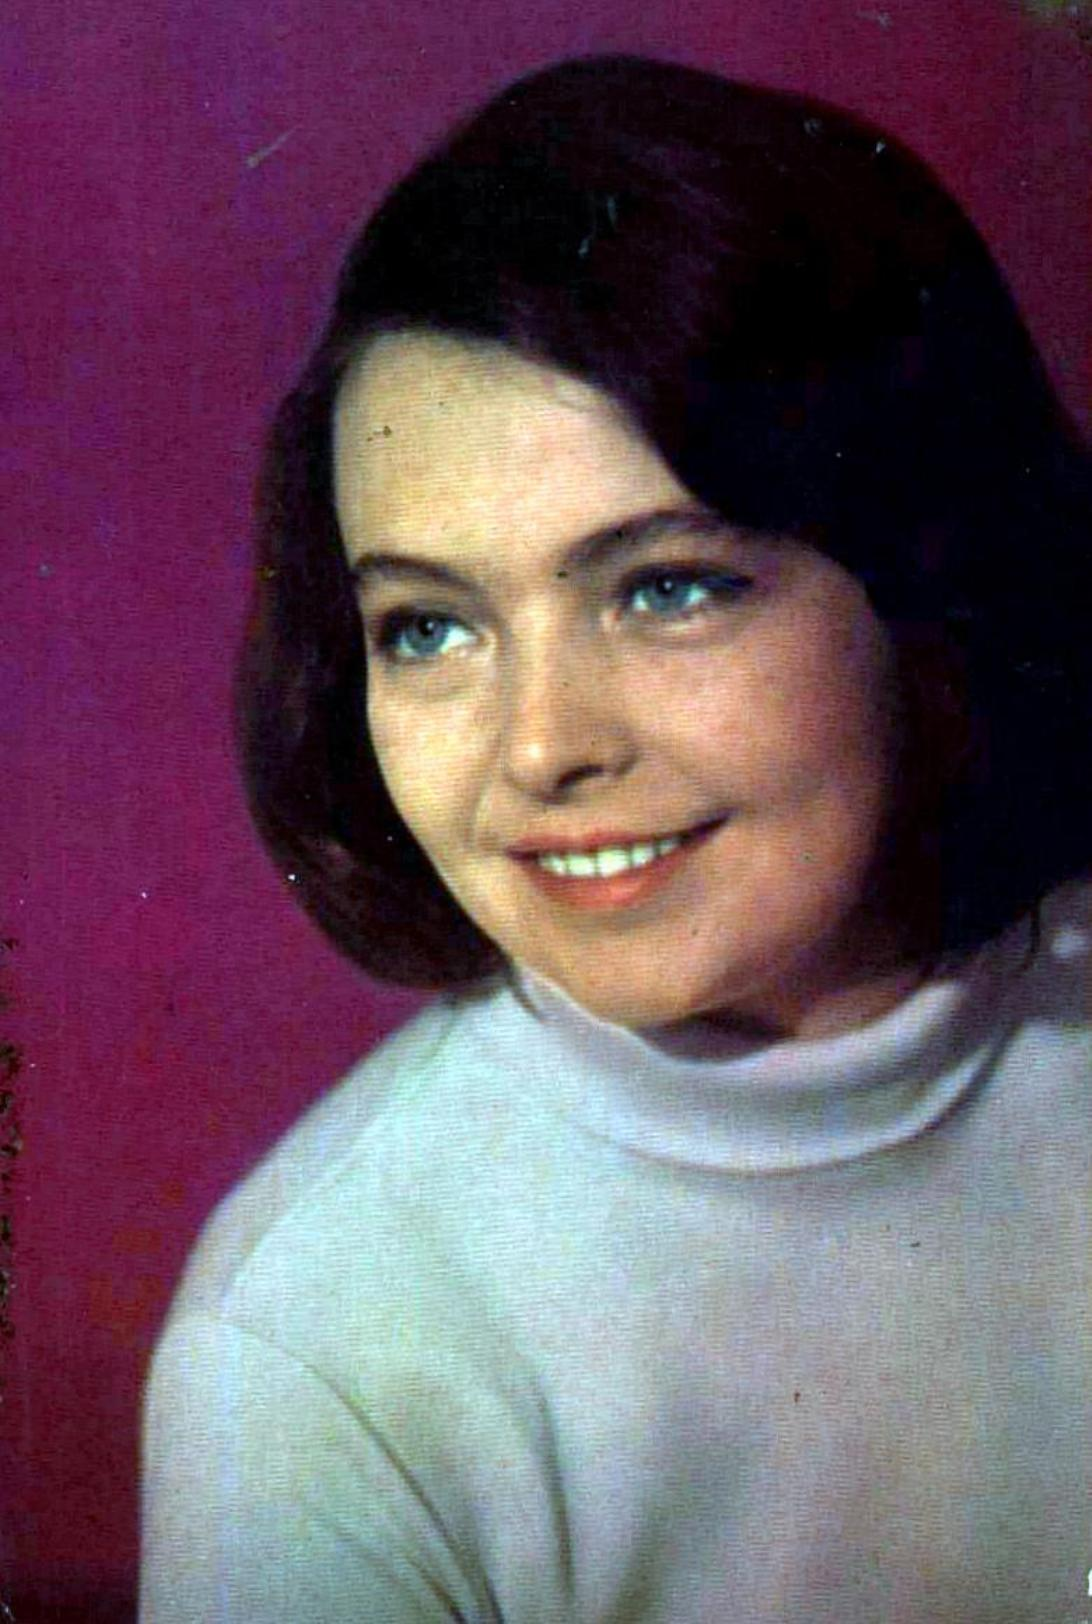 Тамара Совчи, Актёры Советского кино, коллекция открыток